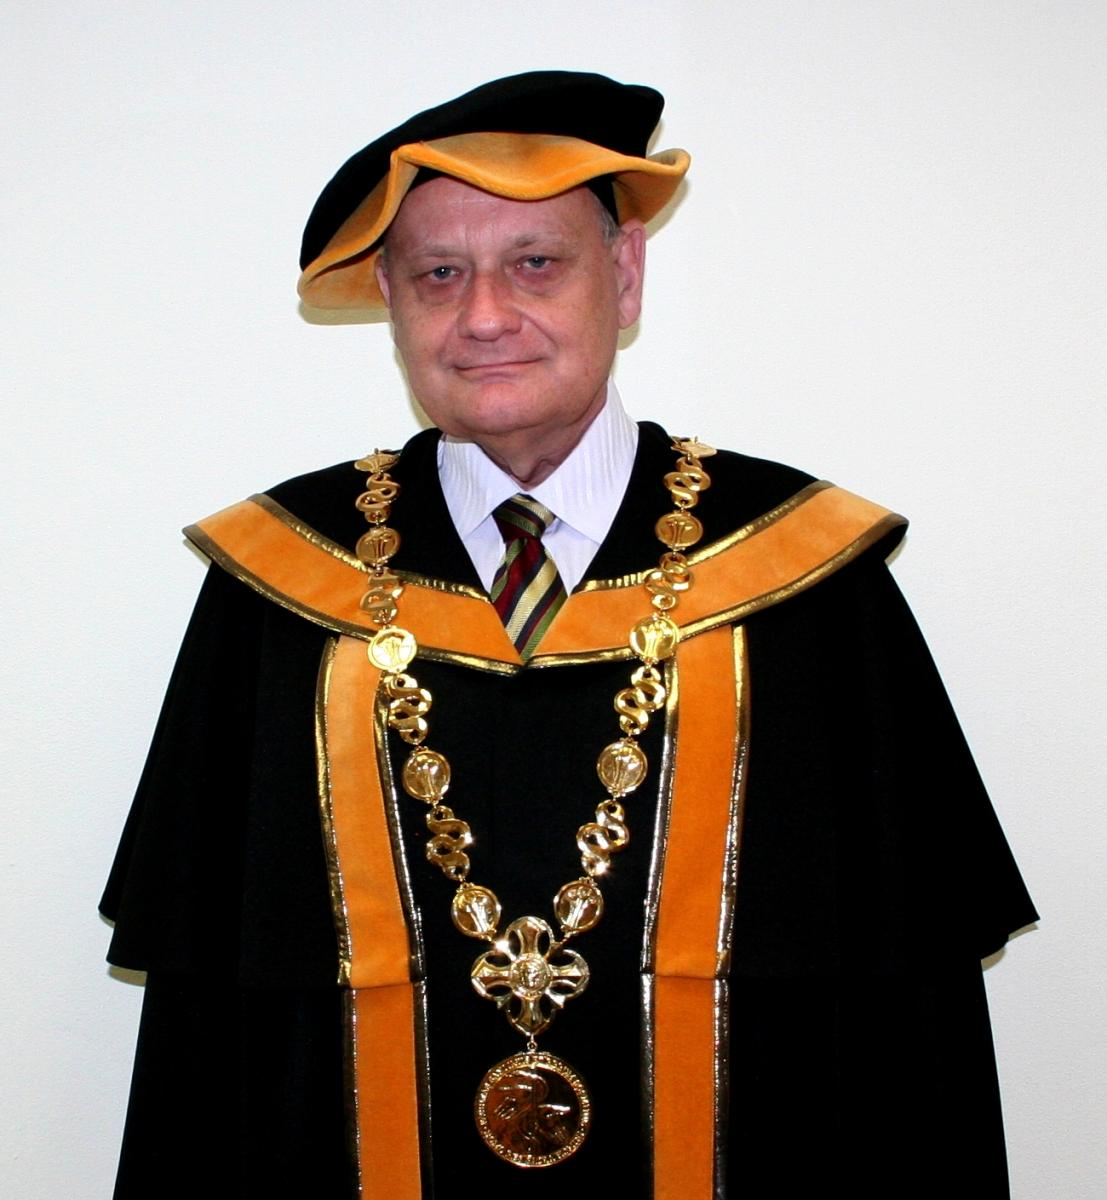 Prof. MUDr. Jaroslav Slaný, CSc.